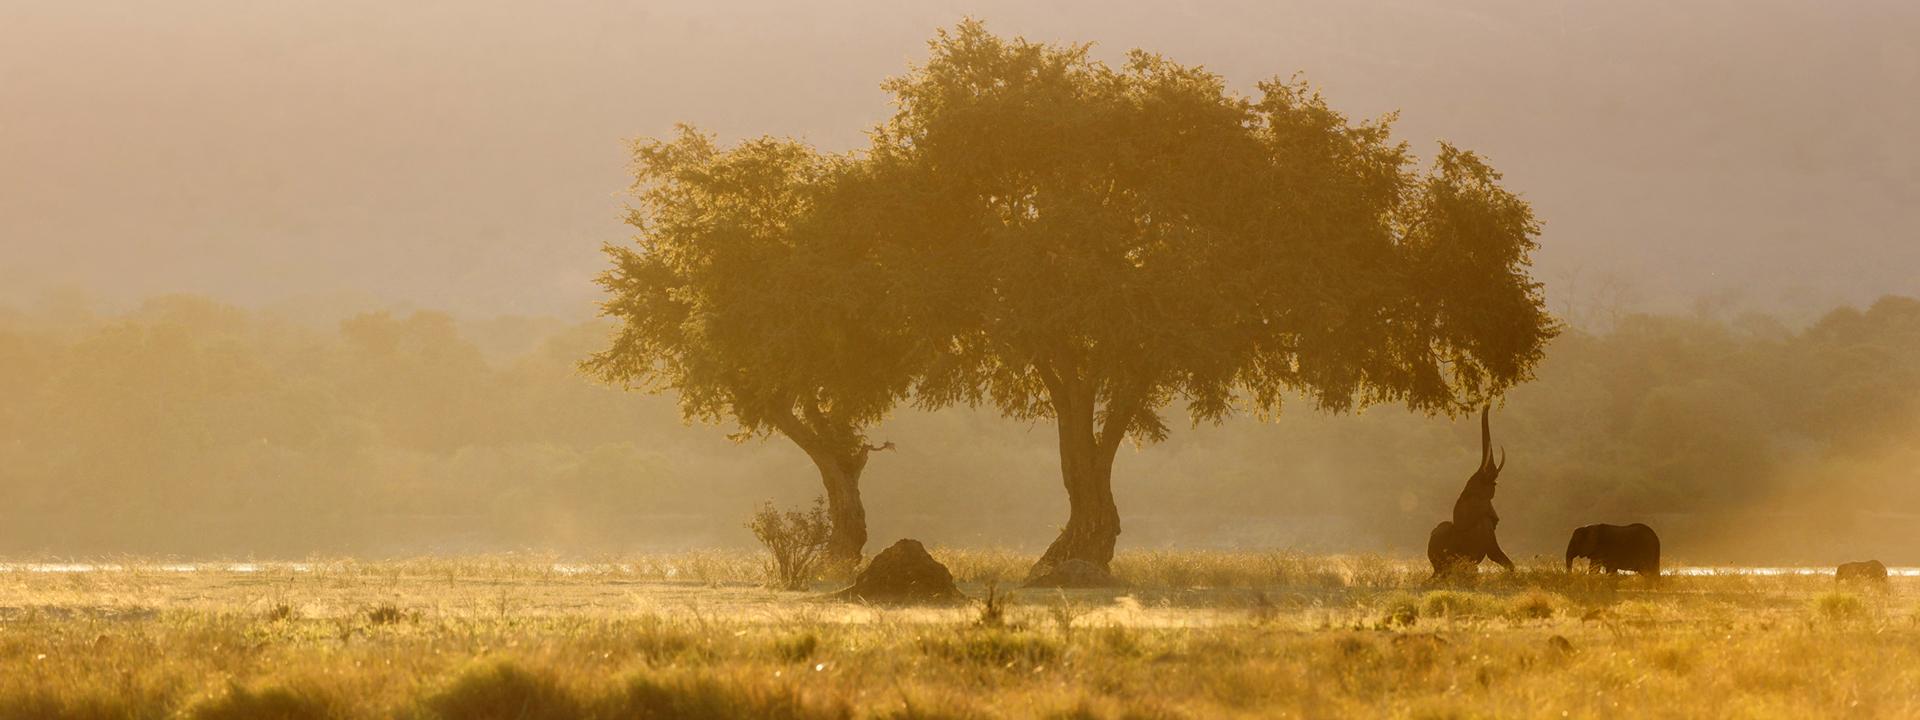 Sonnenuntergang Mana Pools, Simbabwe